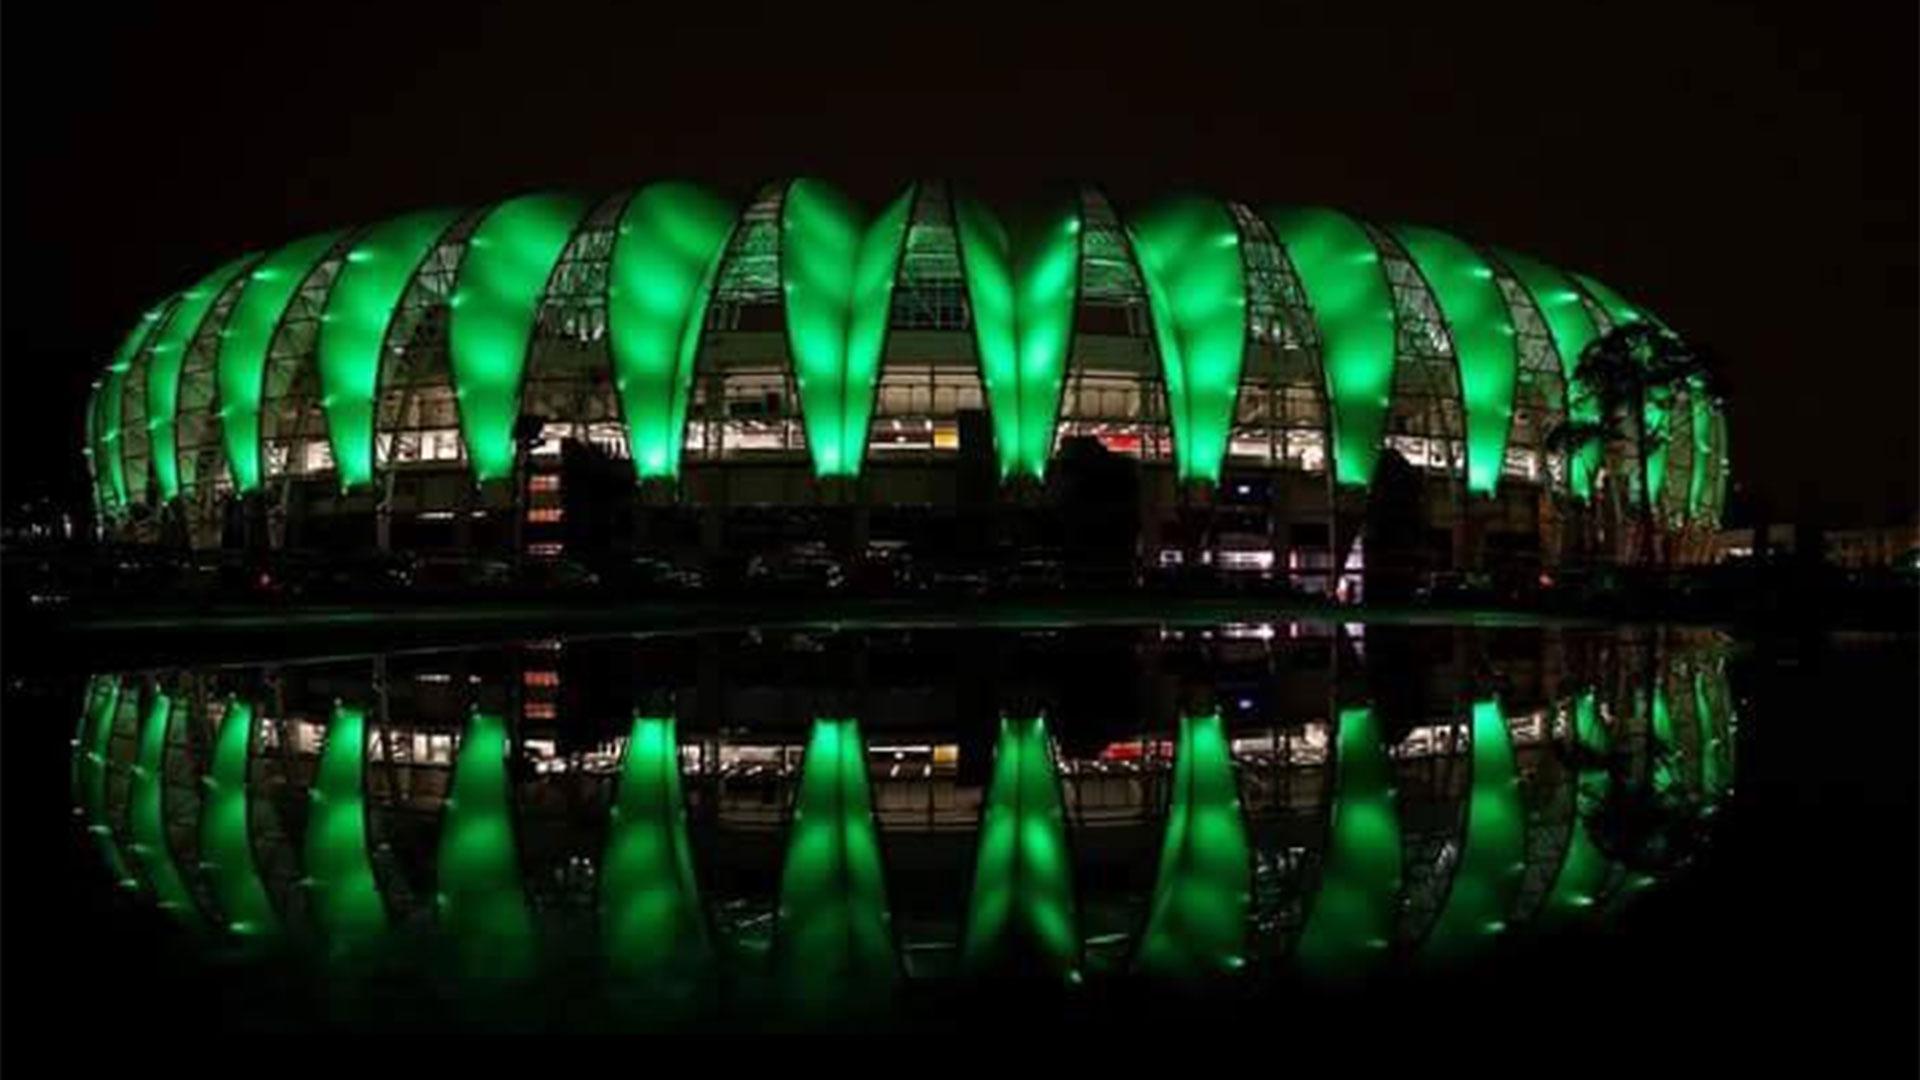 estadio-beira-rio-porto-alegre-brasil